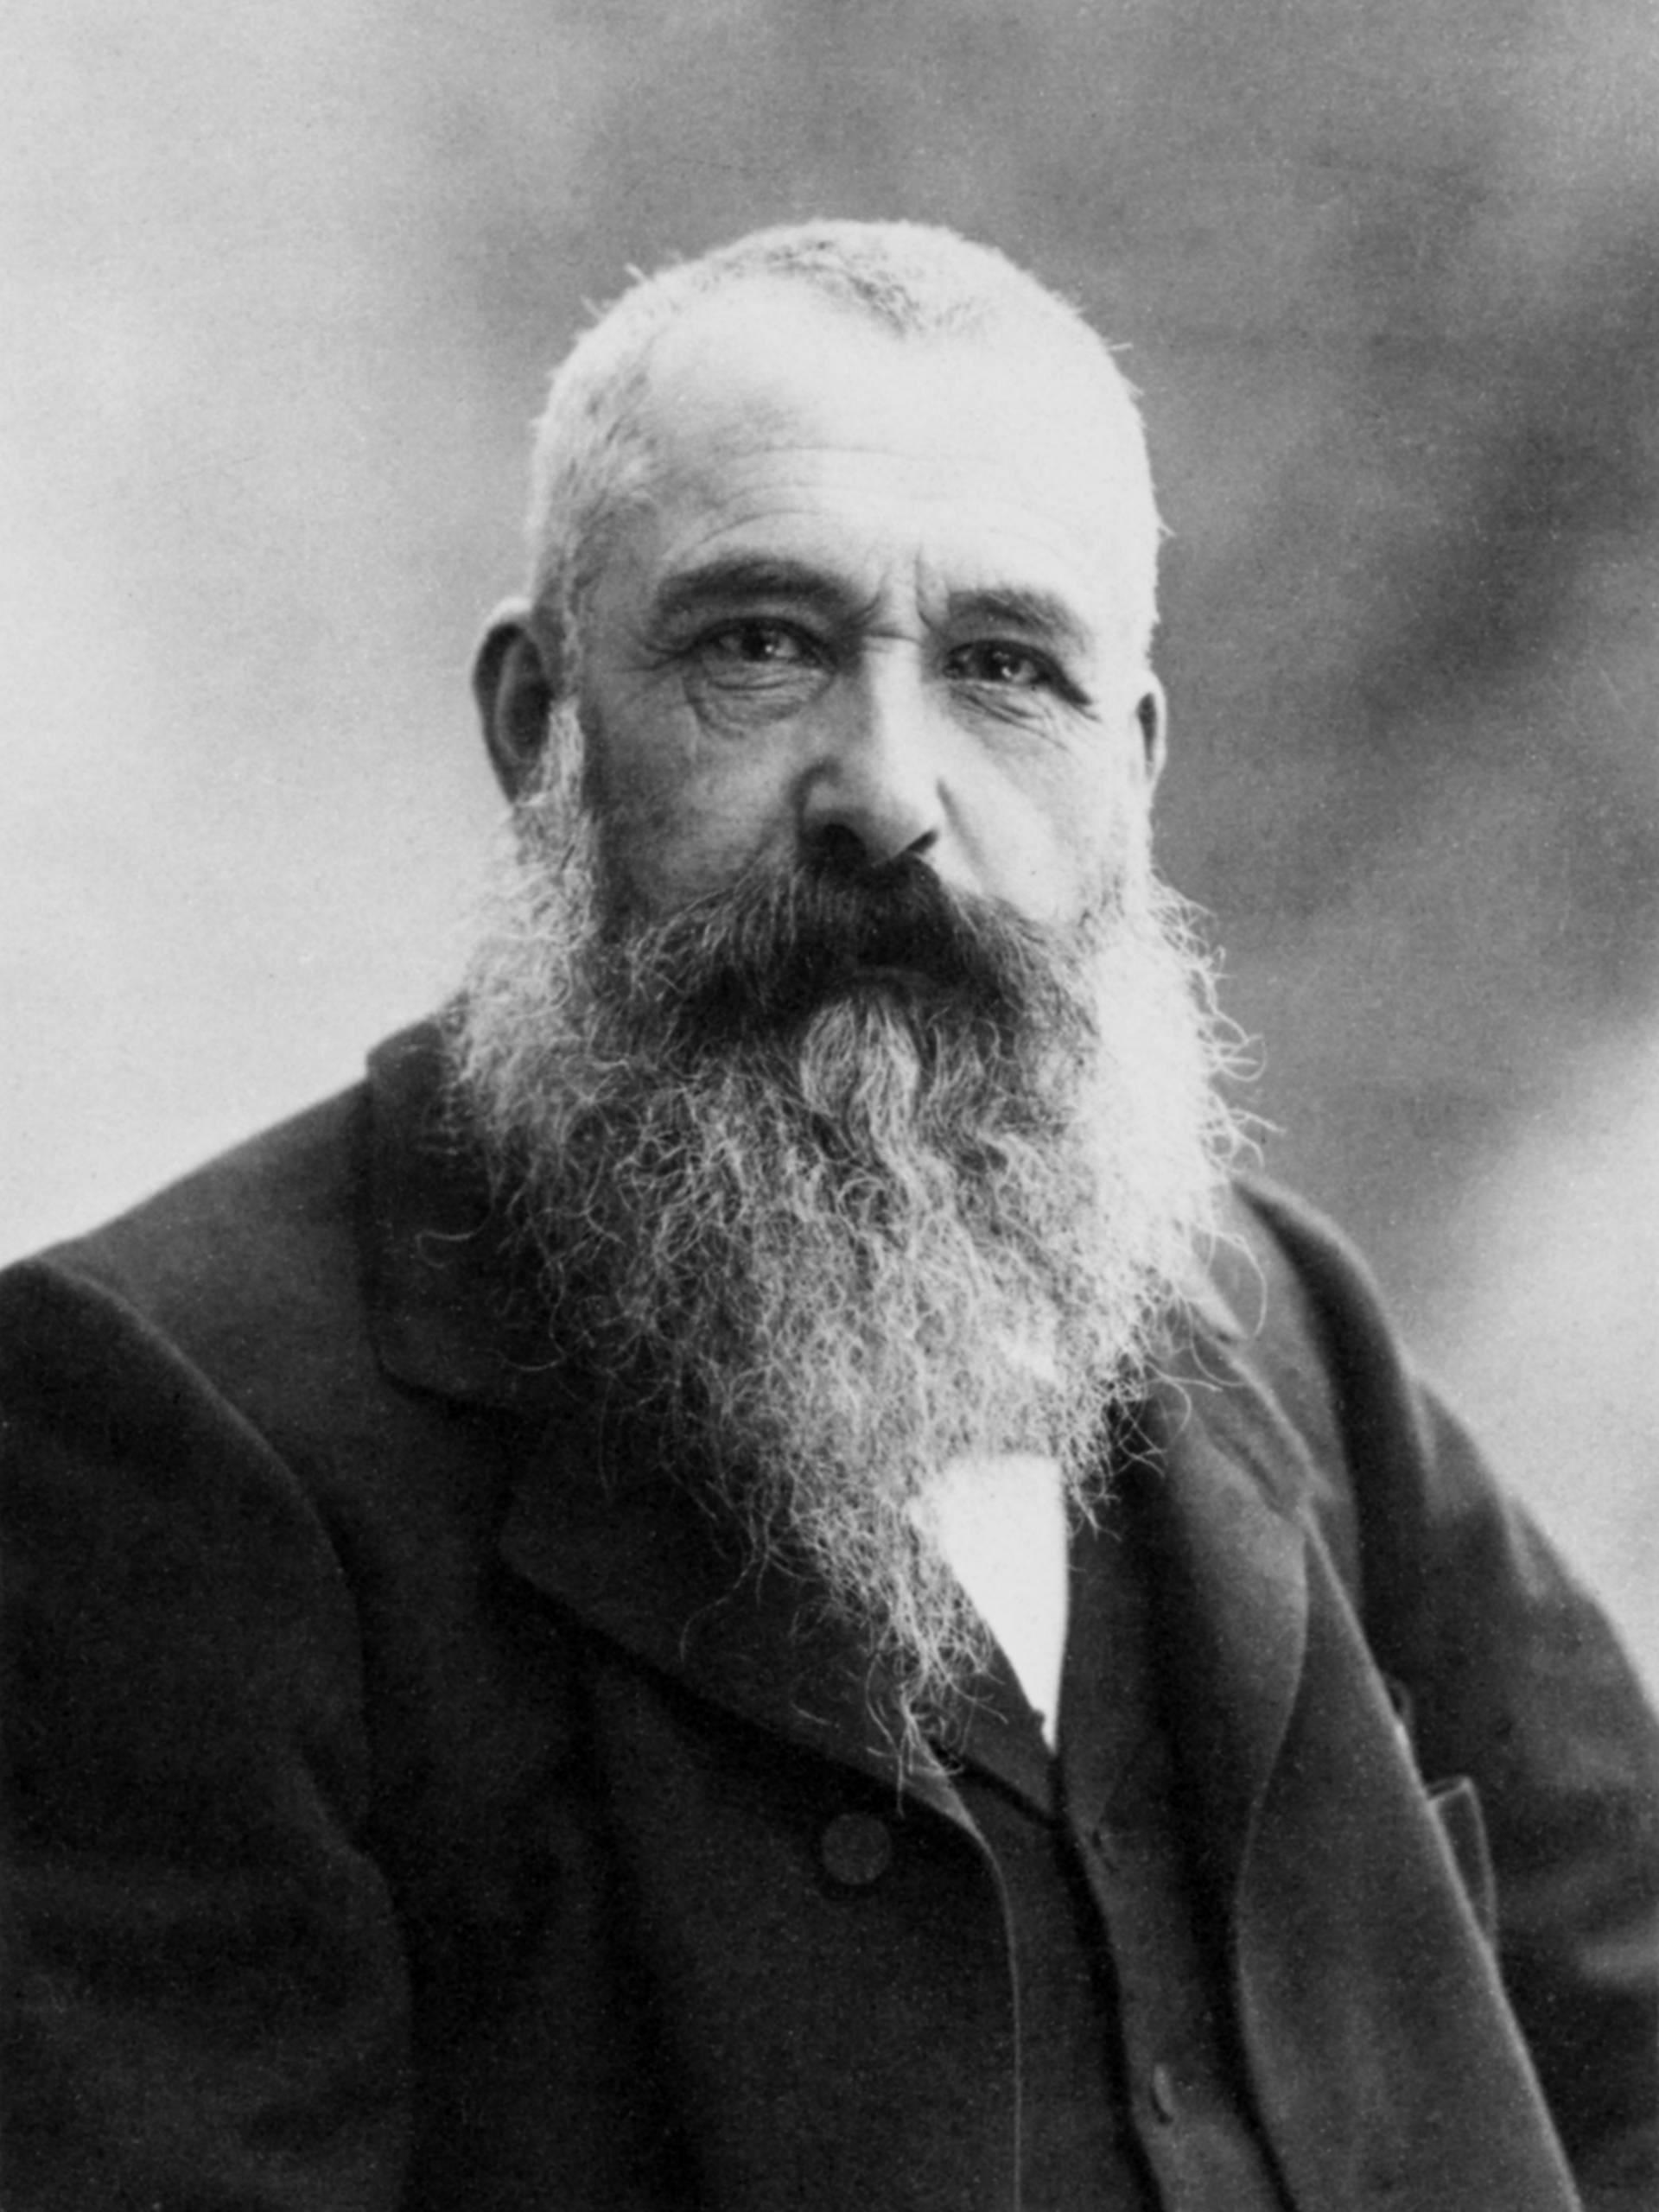 Félix Tournachon, dit Nadar, Claude Monet par Nadar